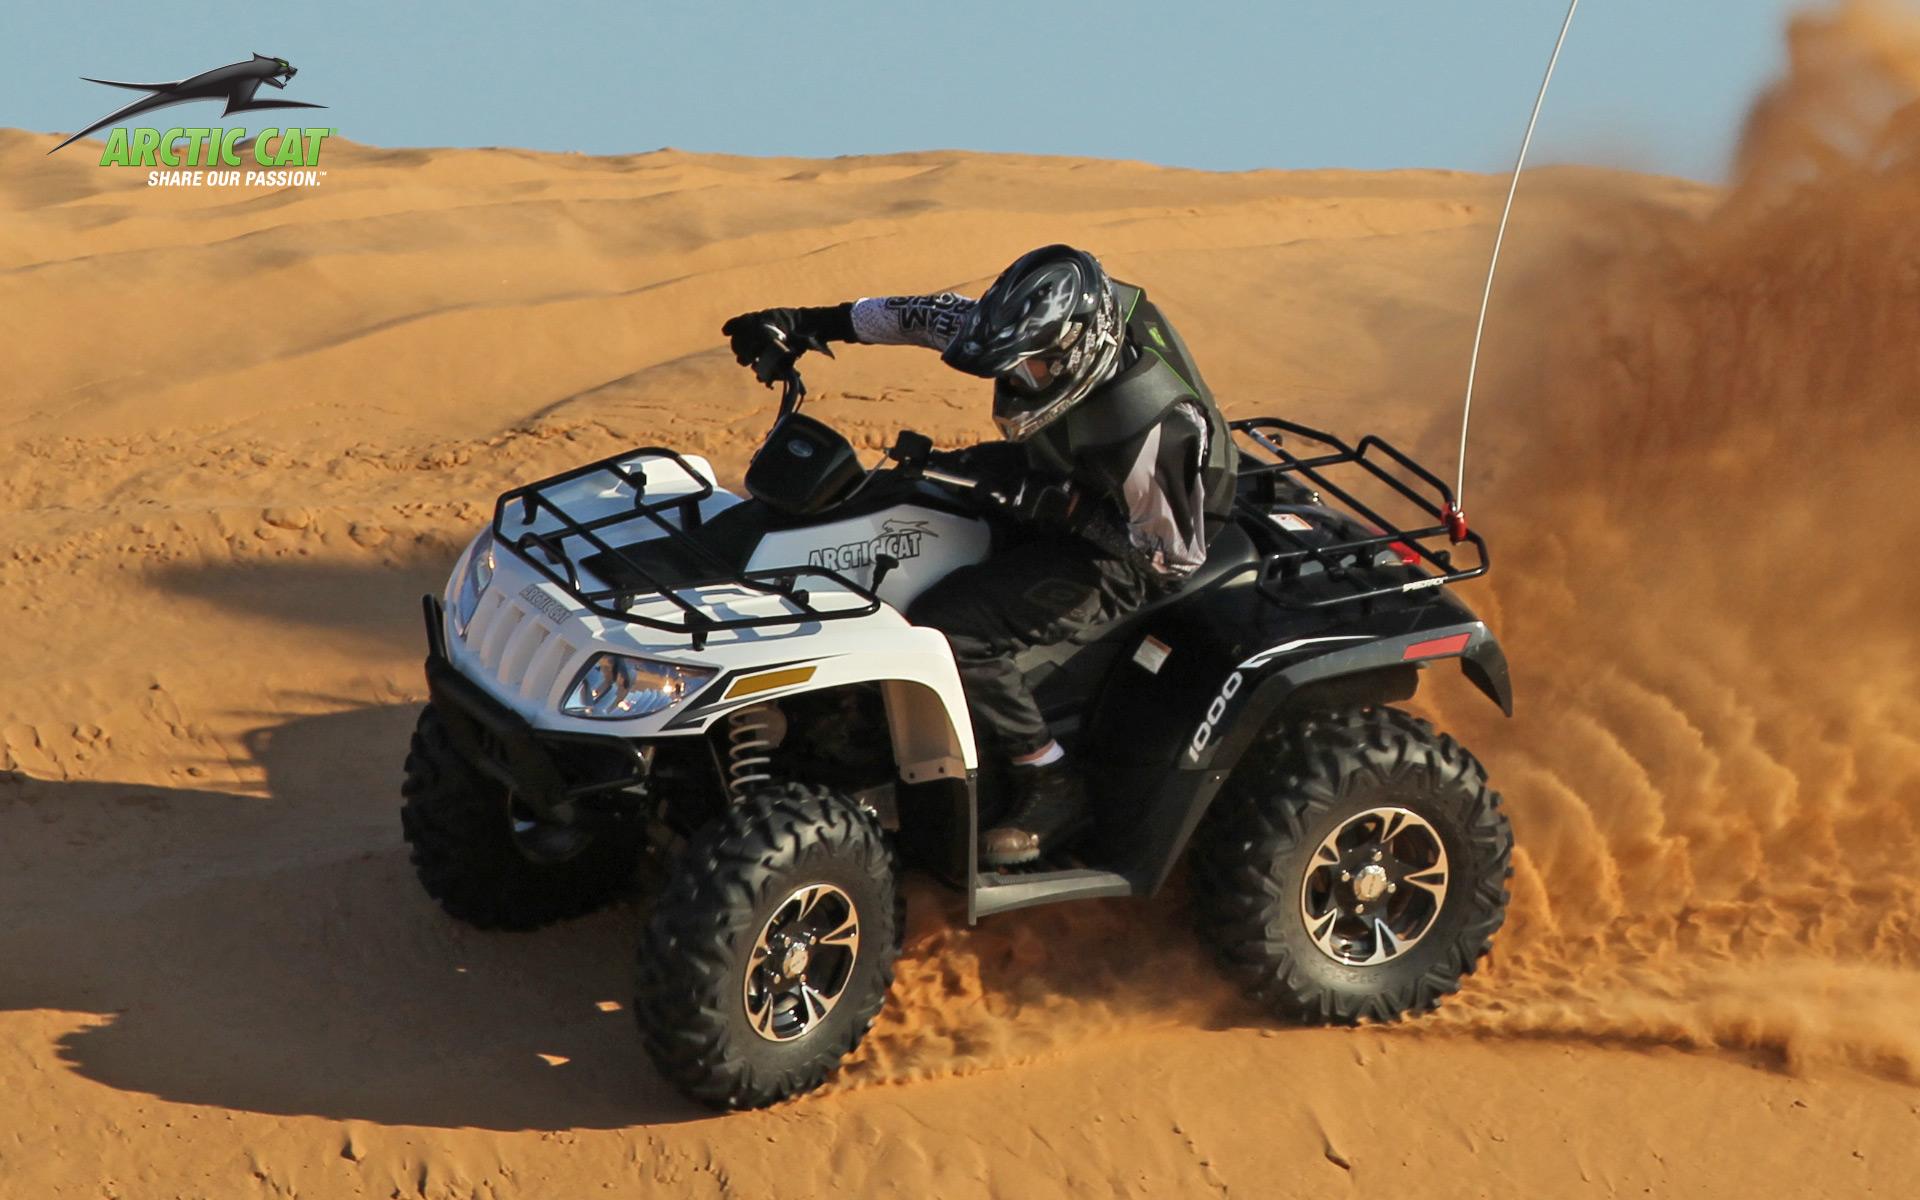 2013 Arctic Cat 1000 XT Utility ATV Model Info - Features